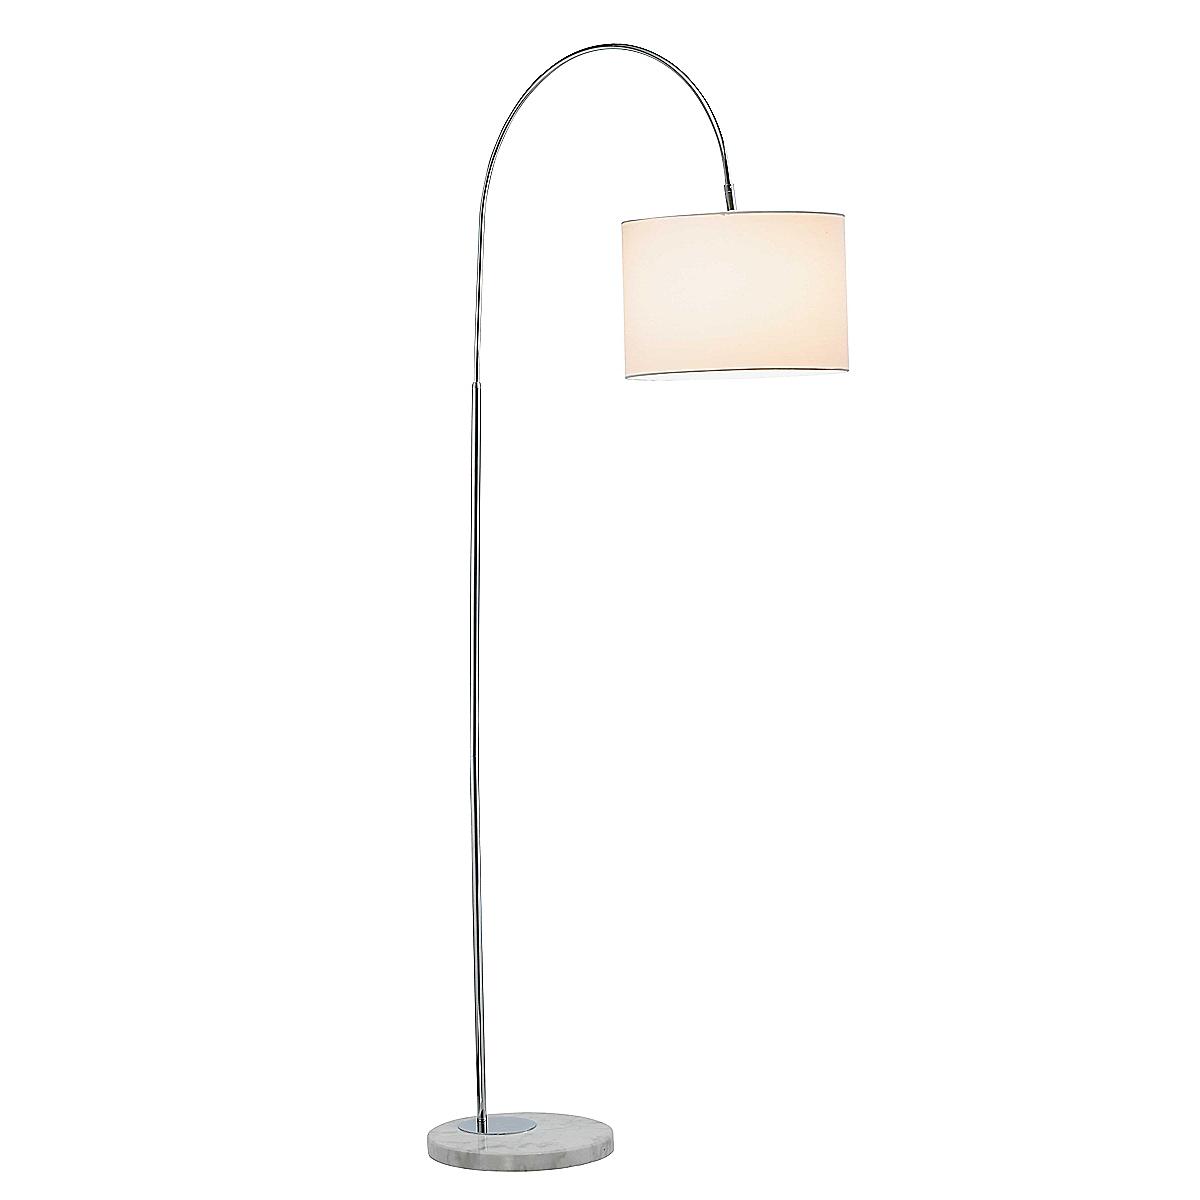 Adjustable Swan Floor Lamp